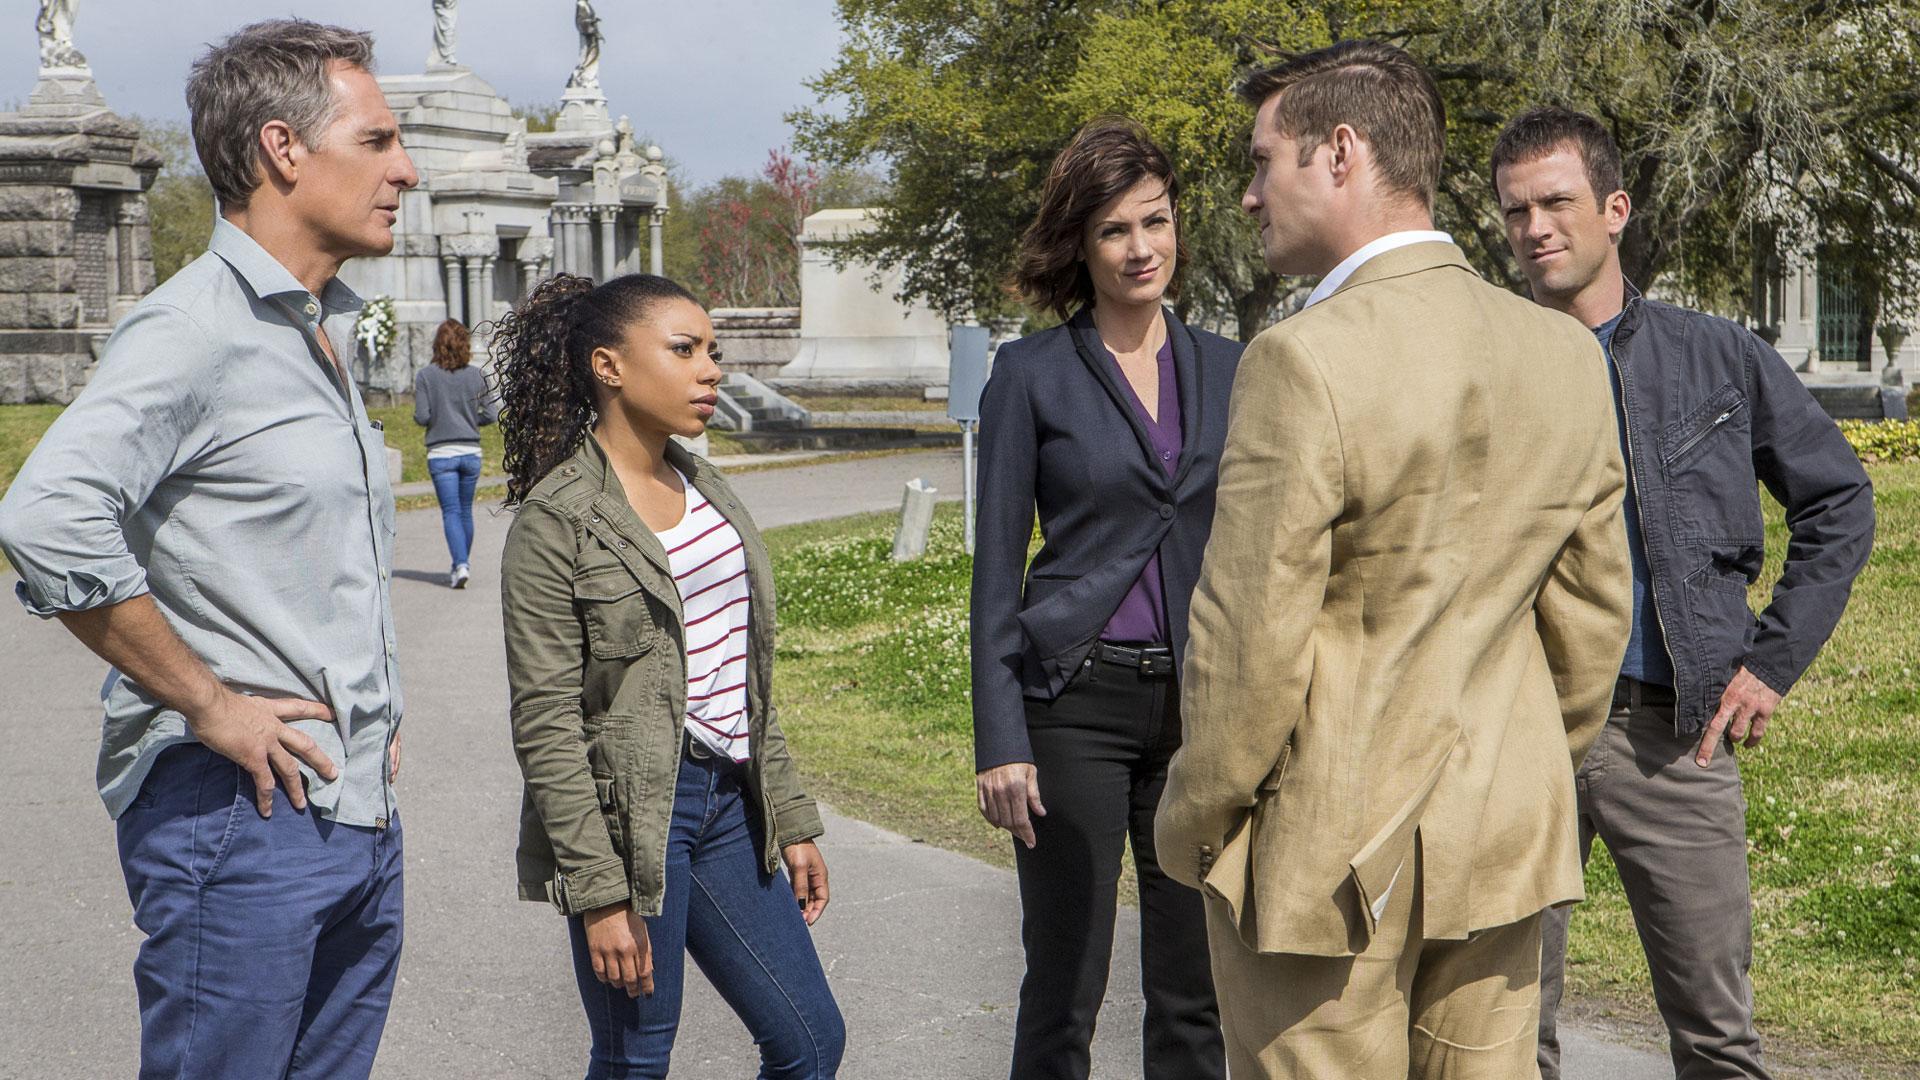 Scott Bakula as Dwayne Pride, Shalita Grant as Sonja Percy, Zoe McLellan as Meredith Brody, and Lucas Black as Christopher LaSalle